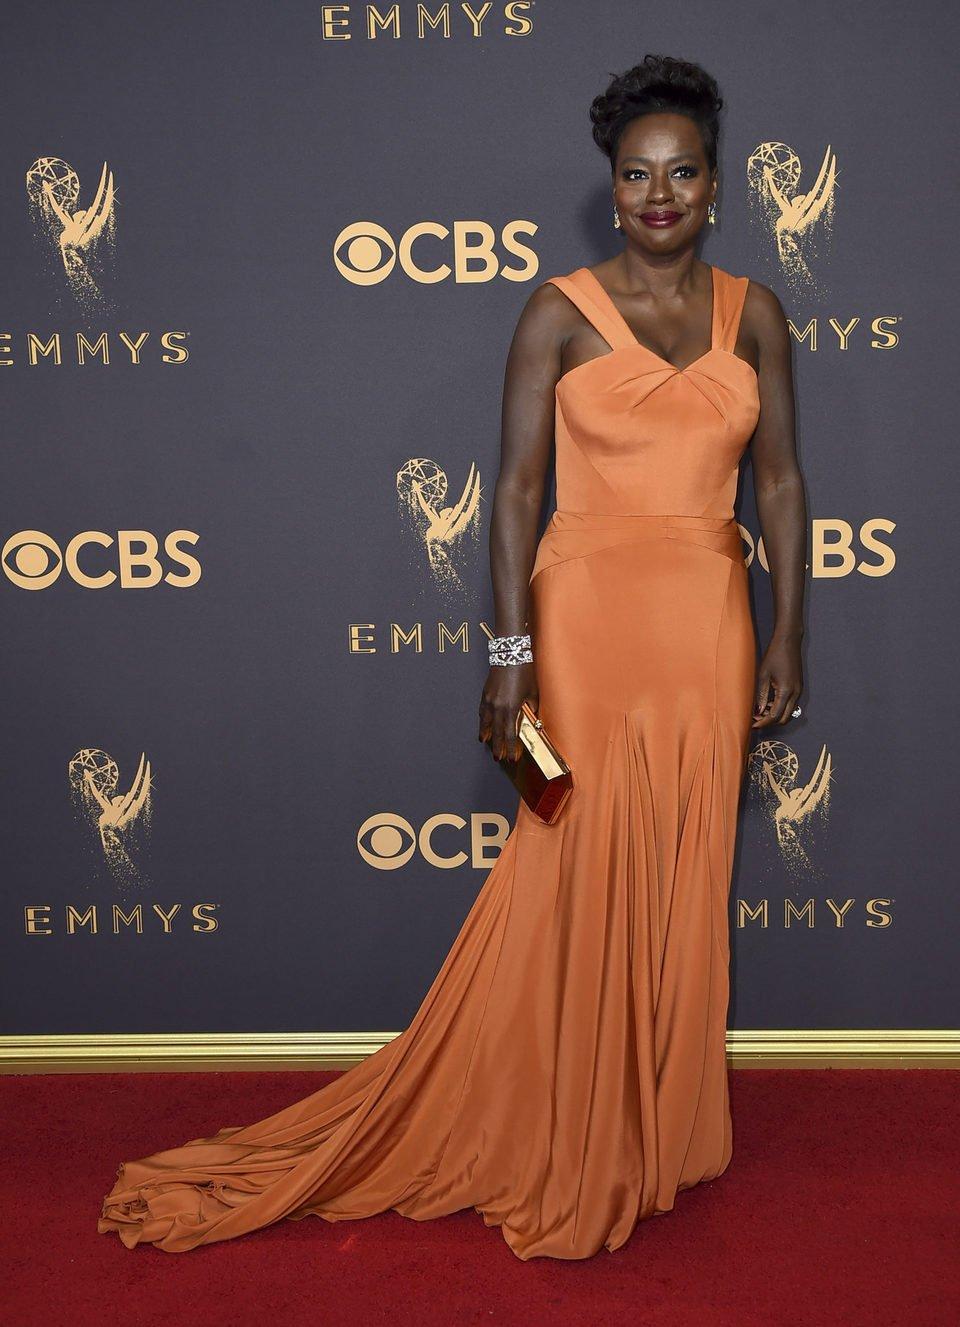 Viola Davis at the Emmys 2017 red carpet